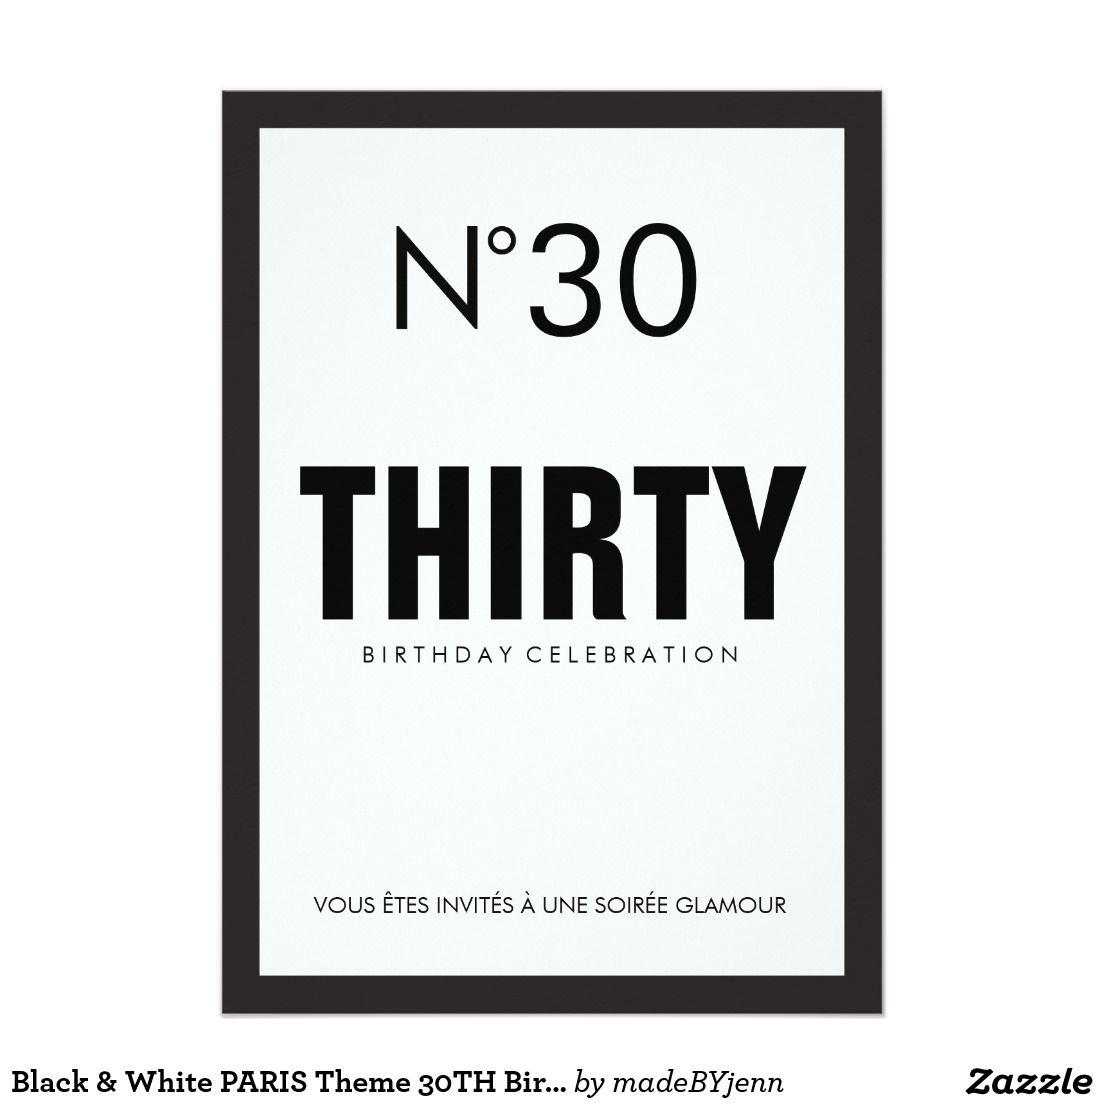 black white paris theme 30th birthday party invitation in 2018